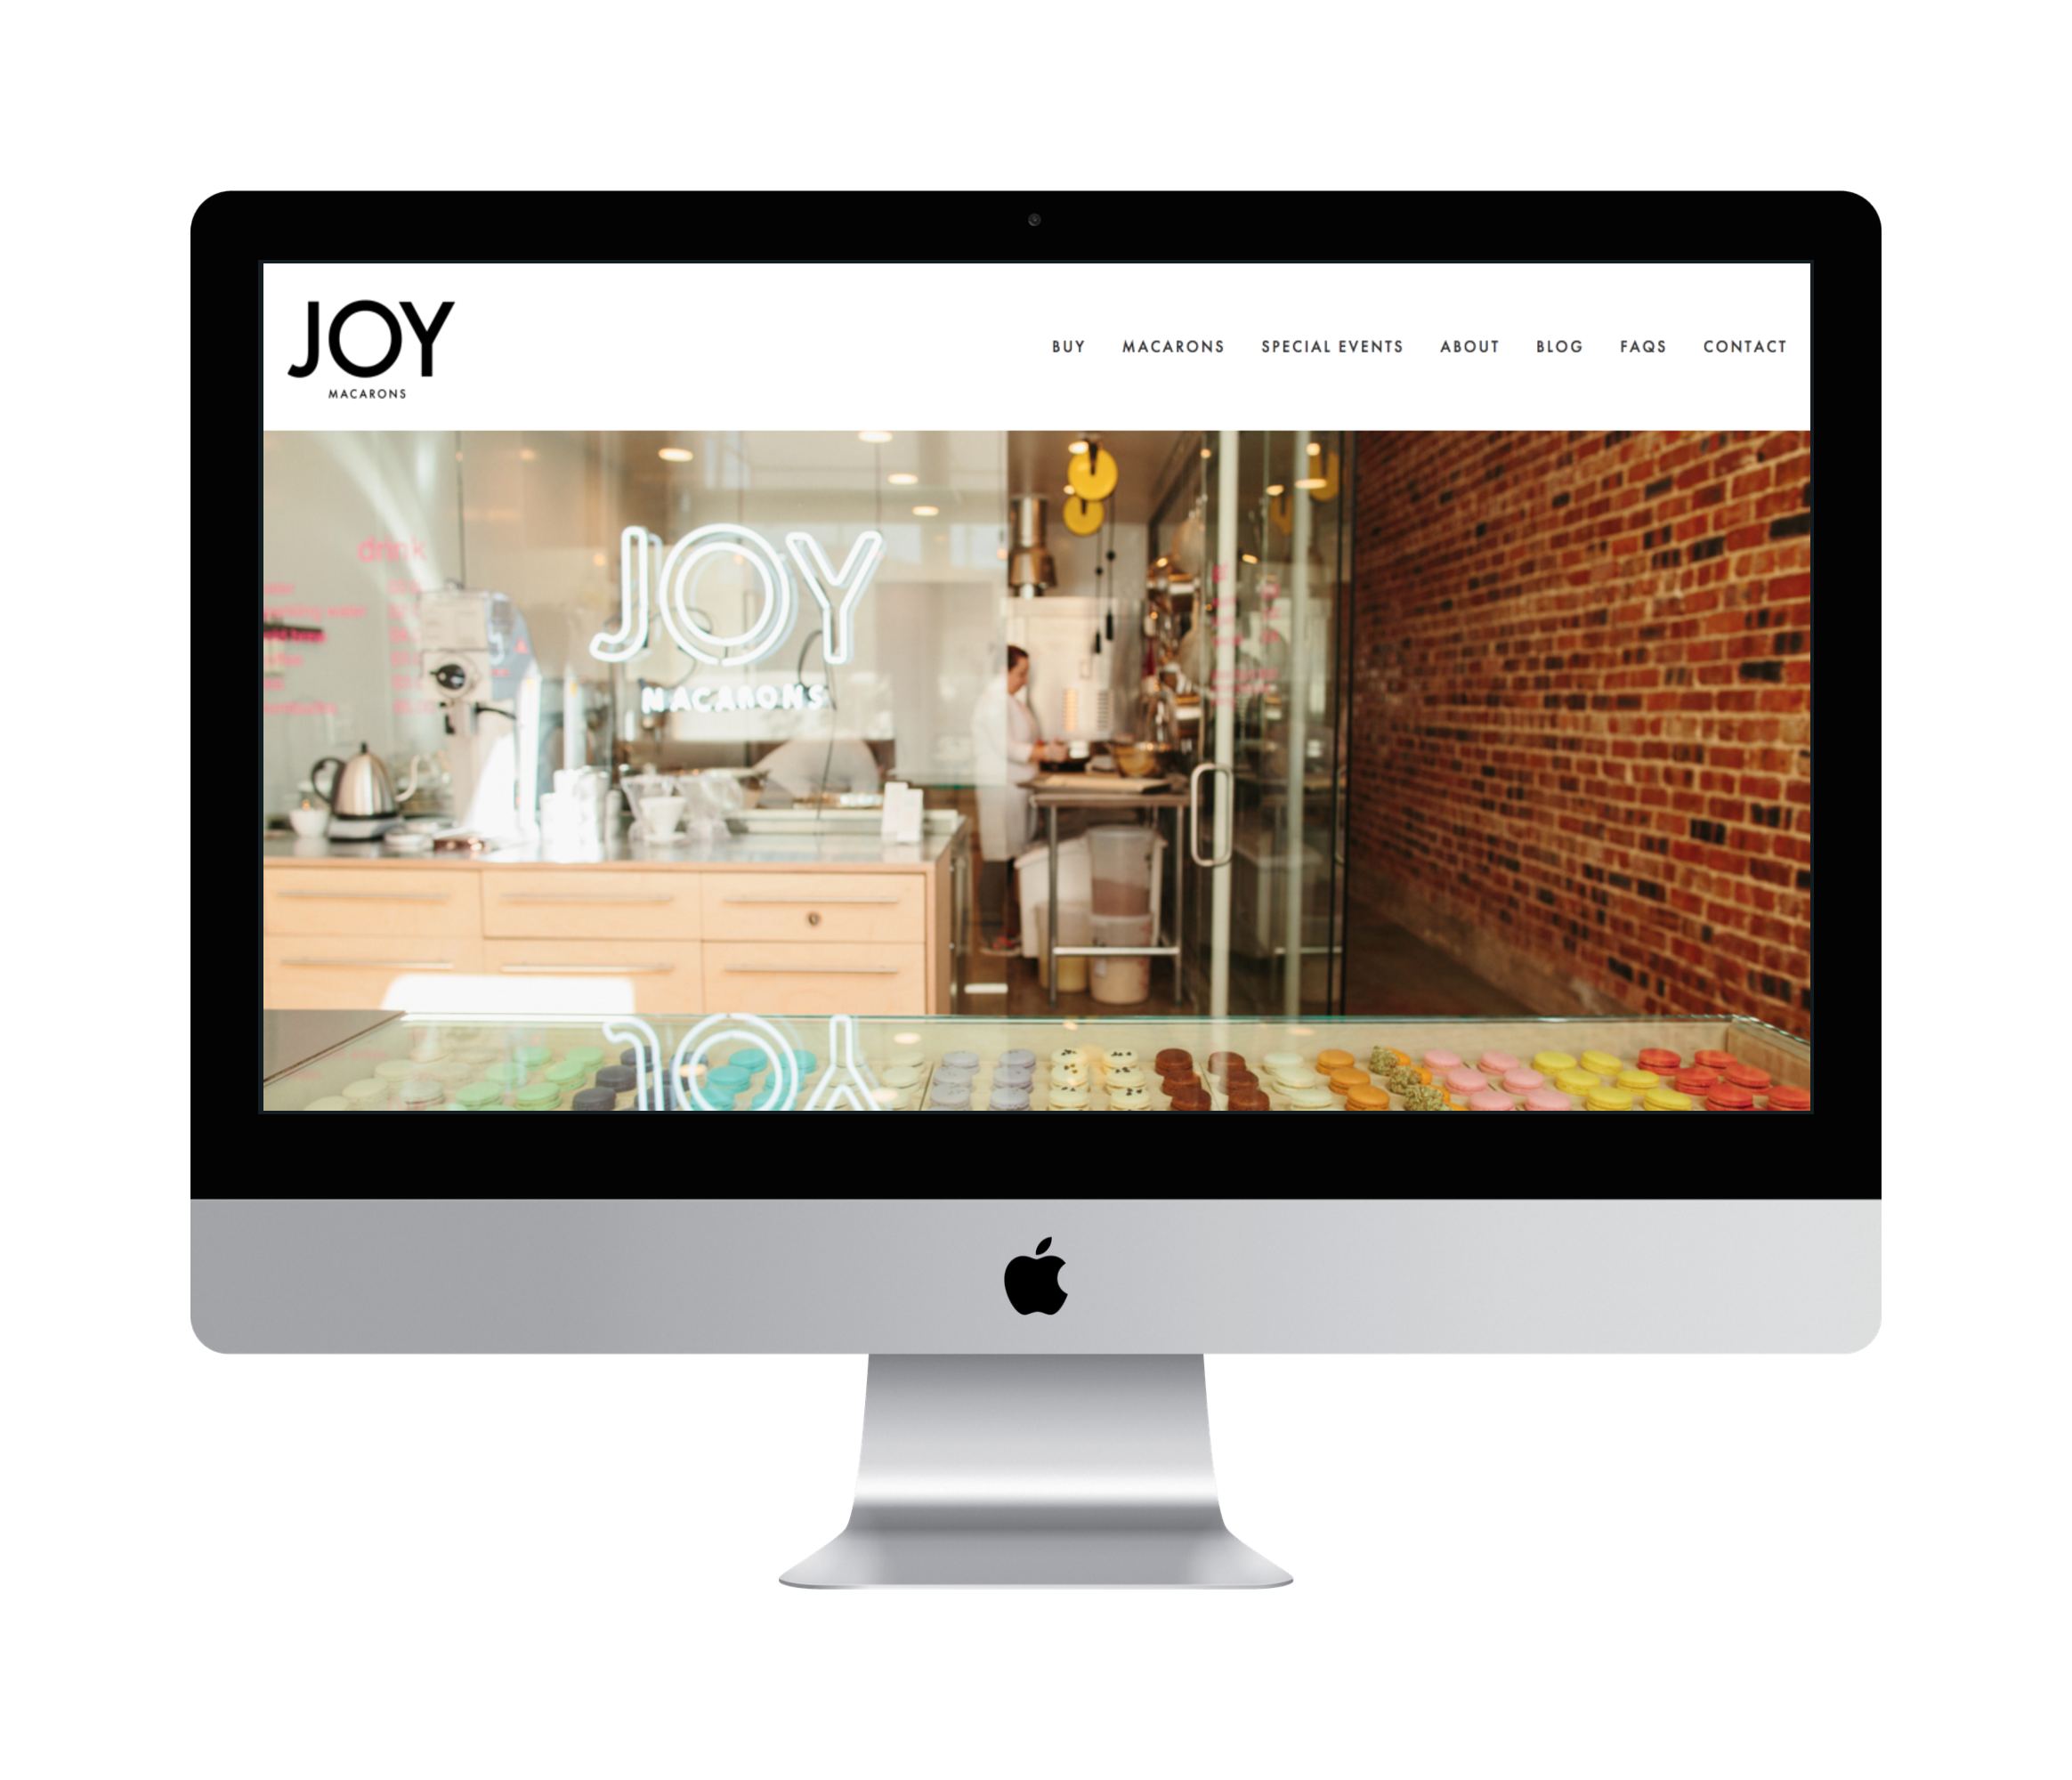 screenshot-www.joymacarons.com 2017-08-09 11-32-52-iMac.png